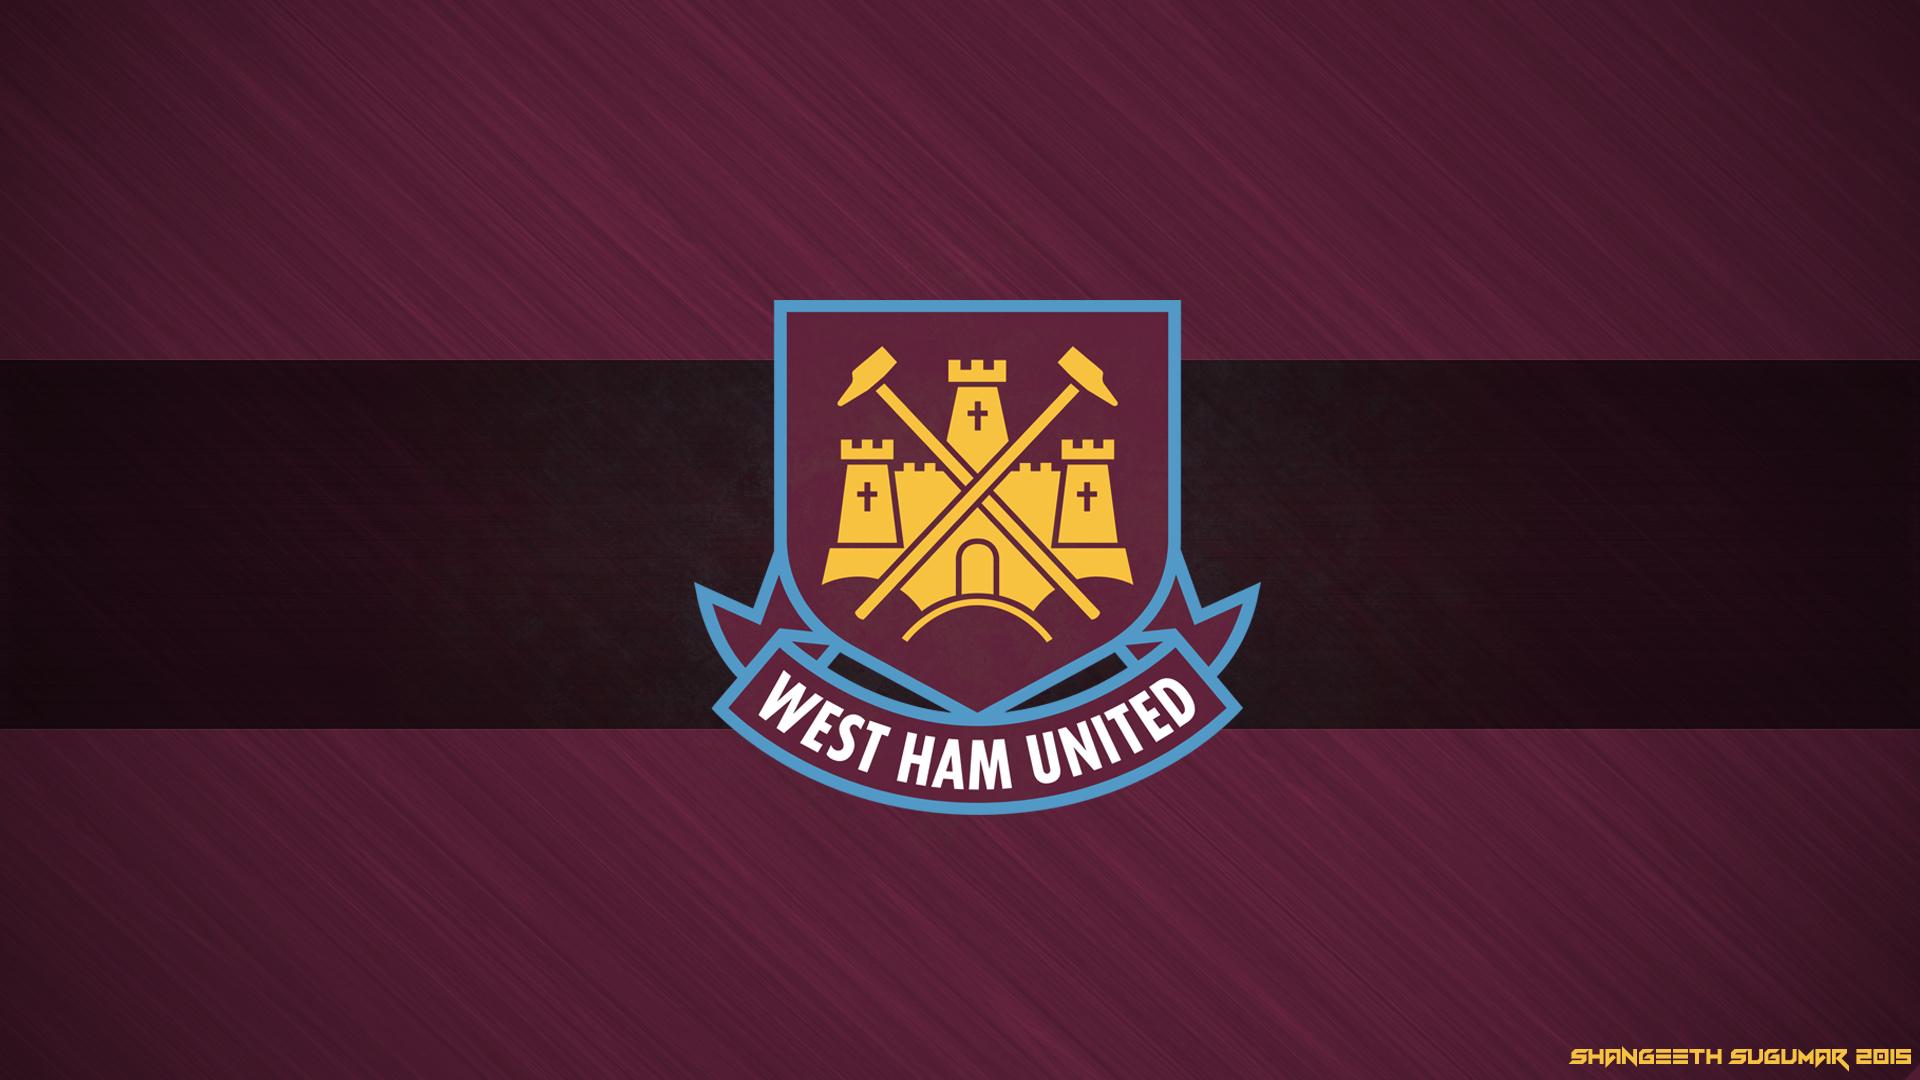 West Ham United 2015 Wallpaper - Shangeeth Sugumar